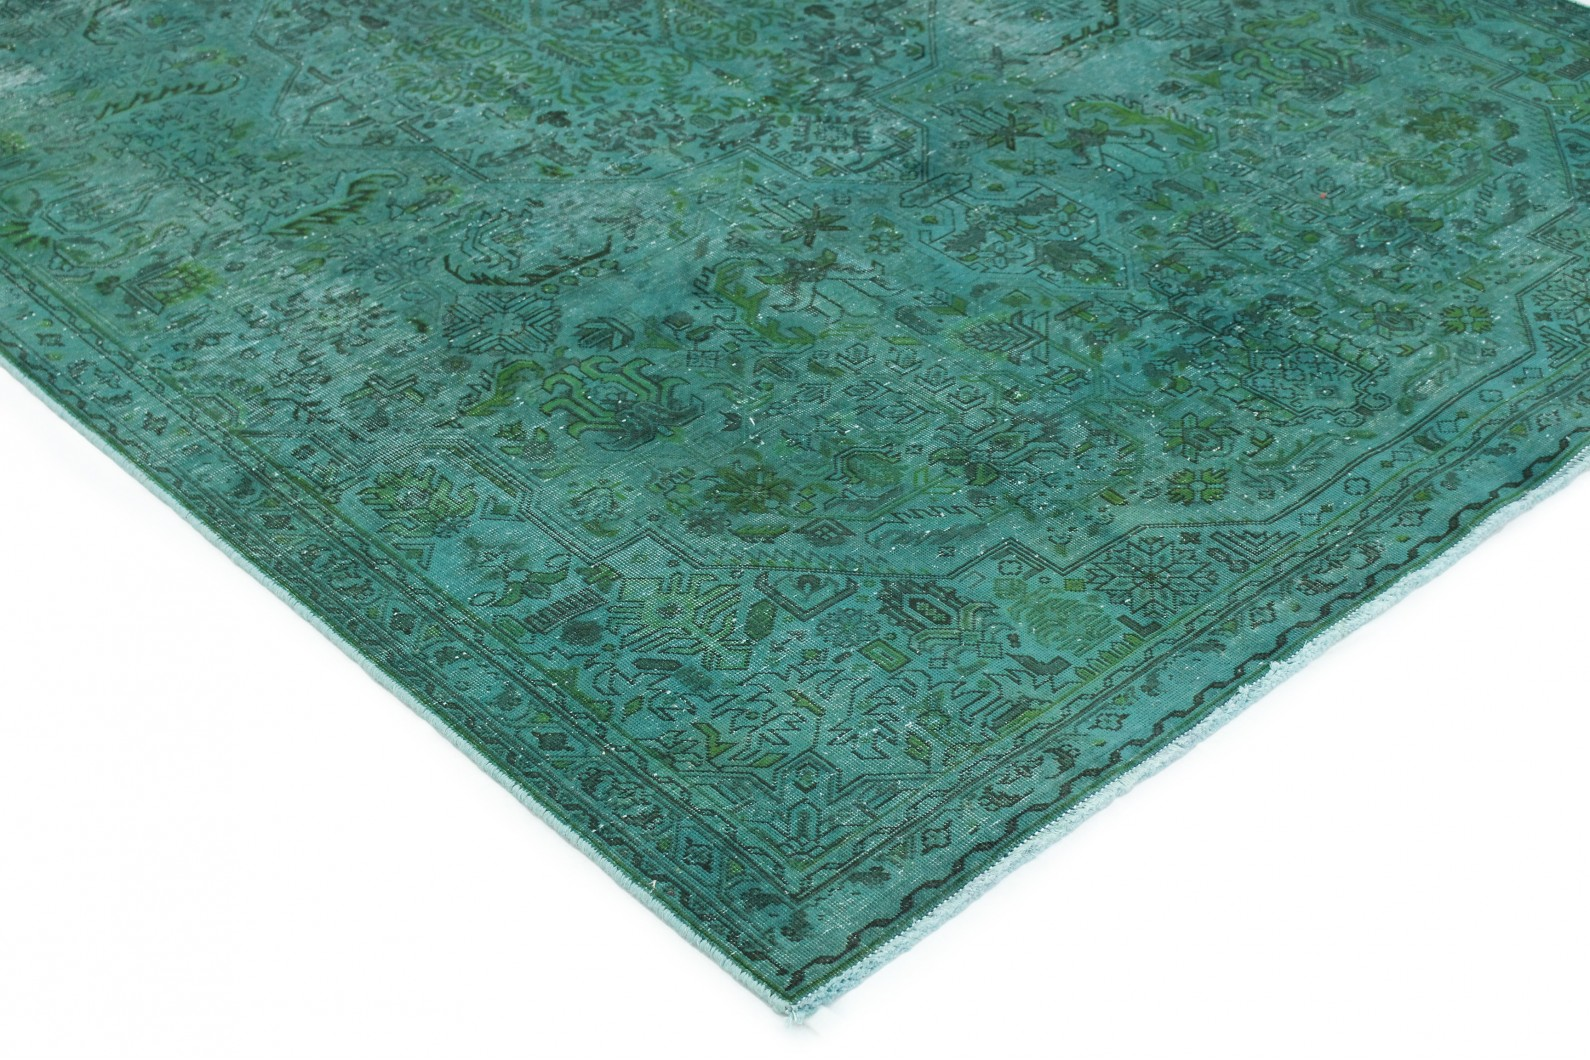 vintage teppich t rkis gr n in 280x190 1001 167224 bei kaufen. Black Bedroom Furniture Sets. Home Design Ideas